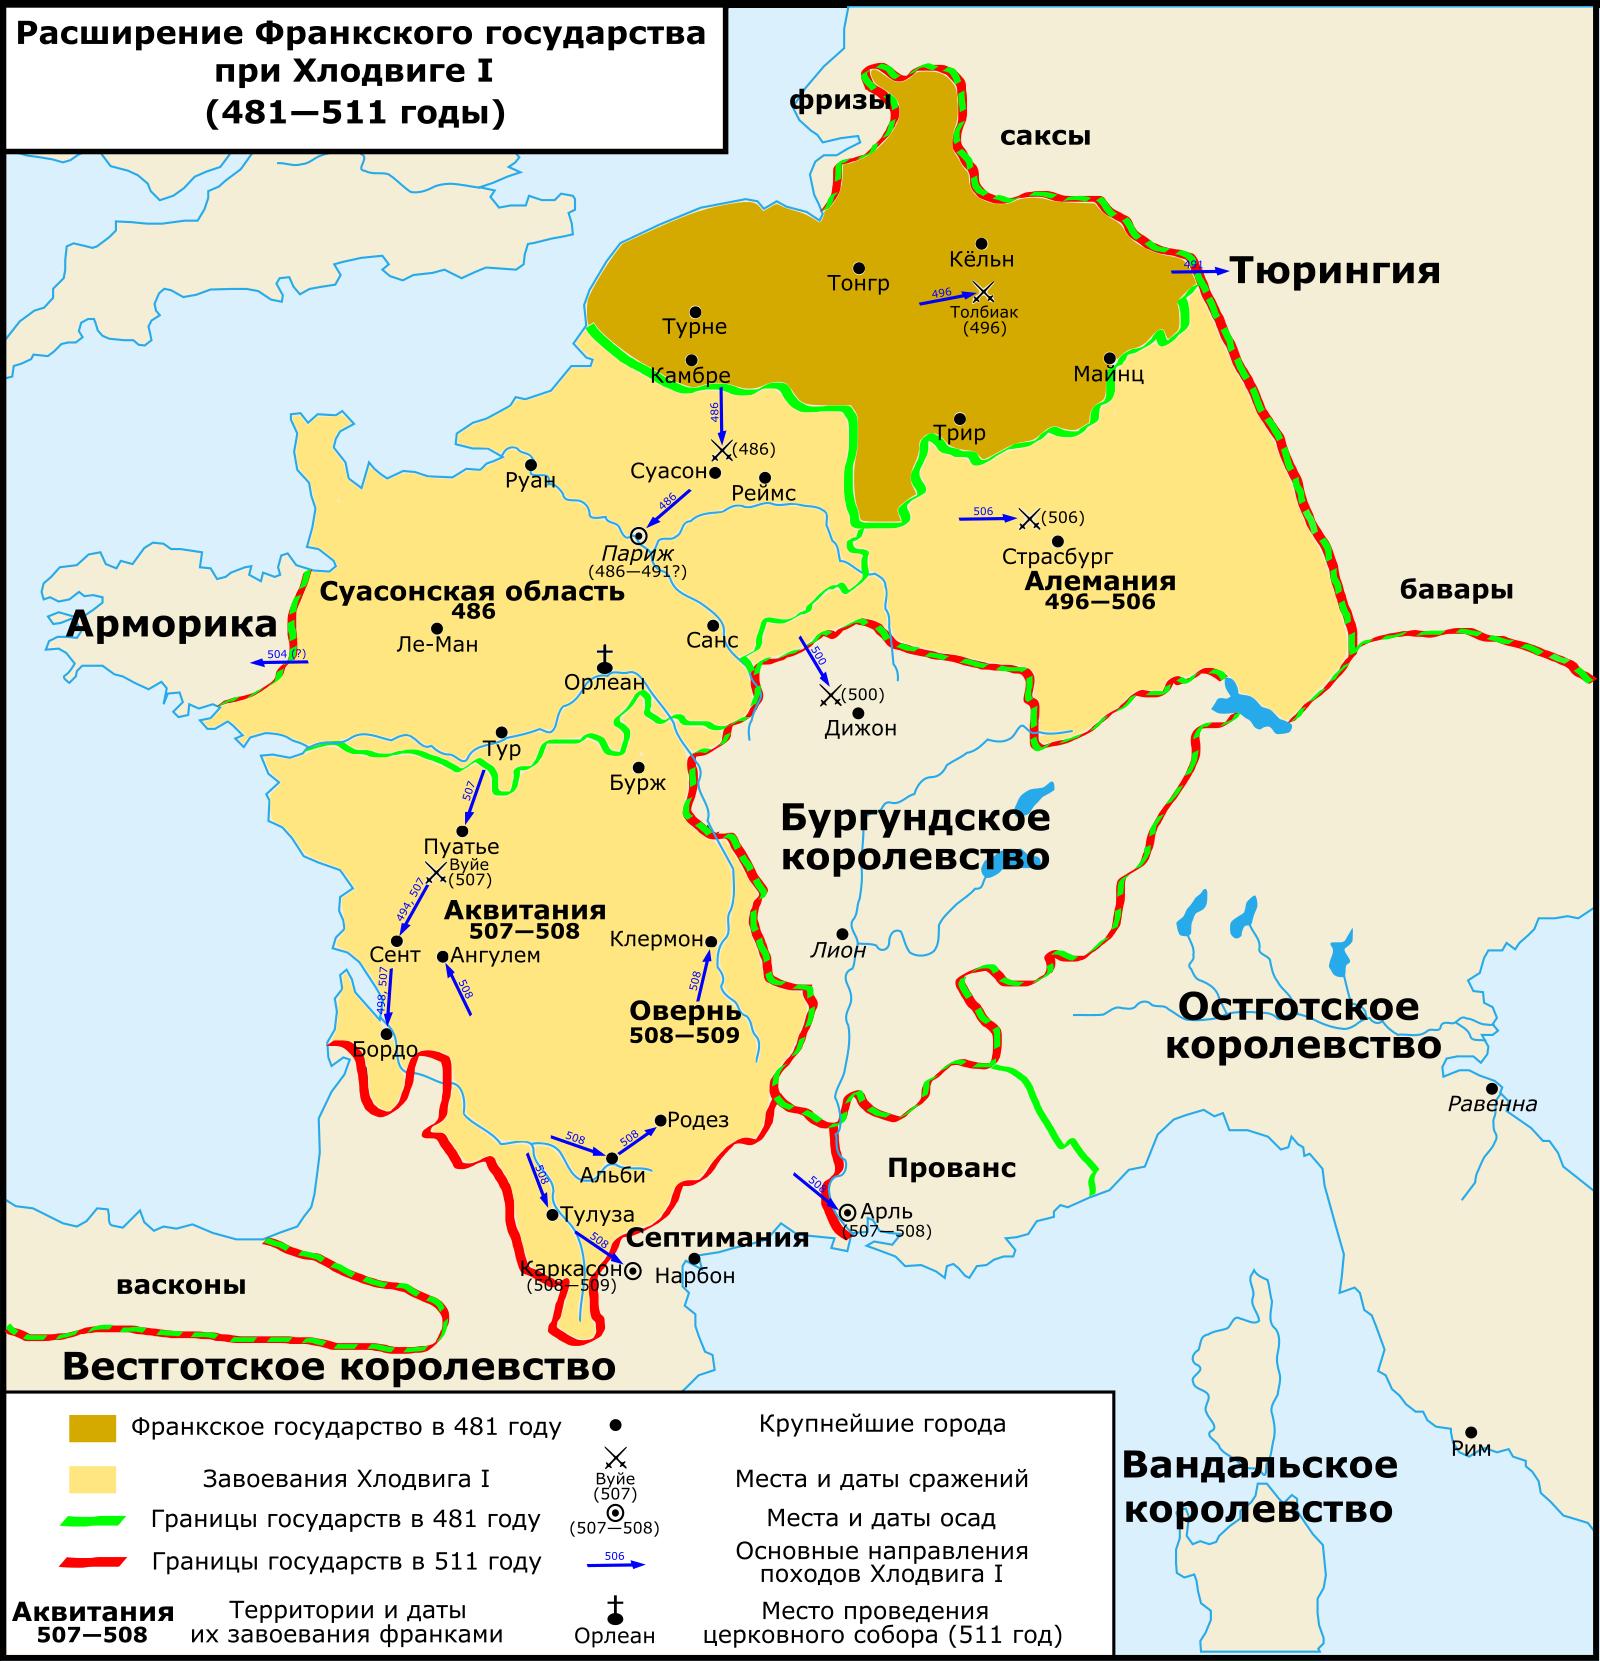 File:Map Gaul 481-511-ru.png - Wikimedia Commons on julius caesar, dacia map, roman republic, hadrian's wall map, roman legion, numidia on a map, iberian peninsula map, thrace map, england map, sparta map, ancient rome, visigoths map, macedonia map, mark antony, battle of alesia, spain map, huns map, cisalpine gaul, hispania map, iberian peninsula, gallic empire, byzantine empire map, alexandria map, sicily map, gallic wars, greece map, carolingian dynasty, zama map, pyrenees map, decline of the roman empire, constantinople map, athens map,